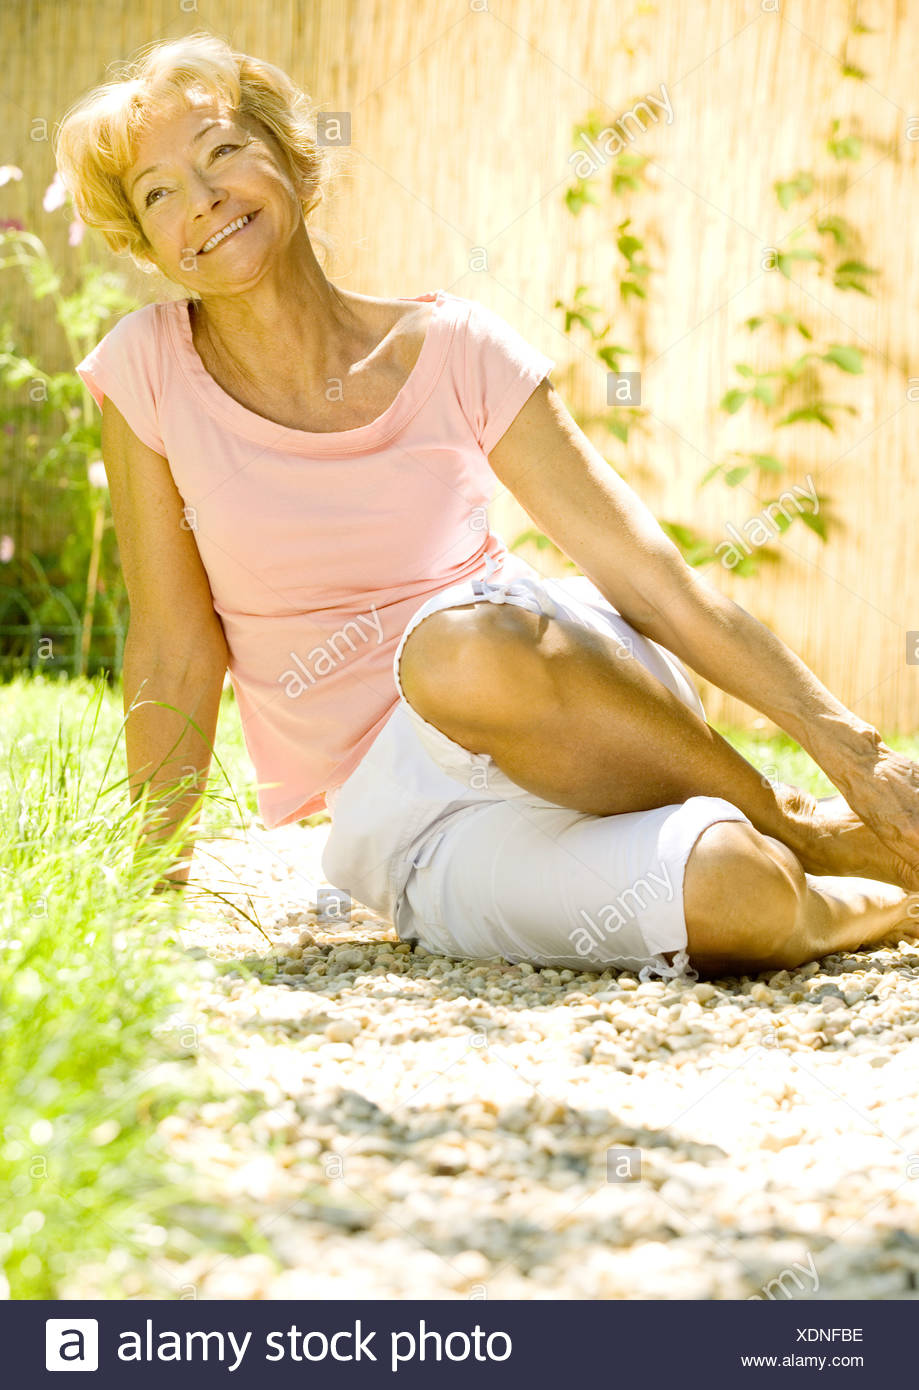 Senior woman sitting on ground outdoors, smiling - Stock Image